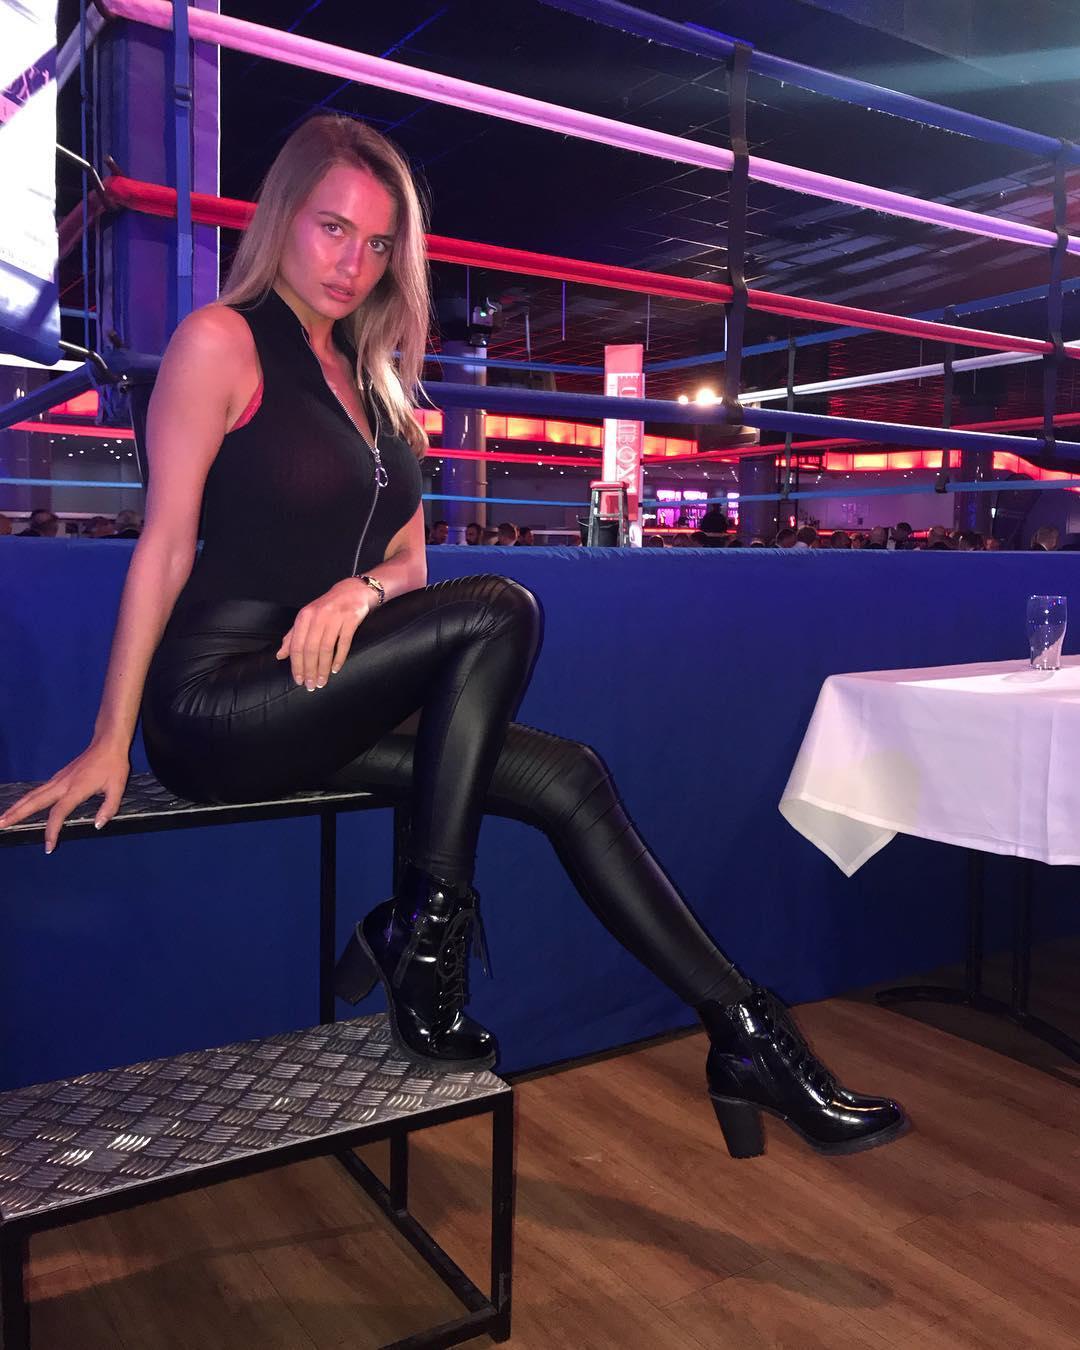 Ring Girls - Private Boxing Event - Butlins, Bognor Regis - 29th November 2018